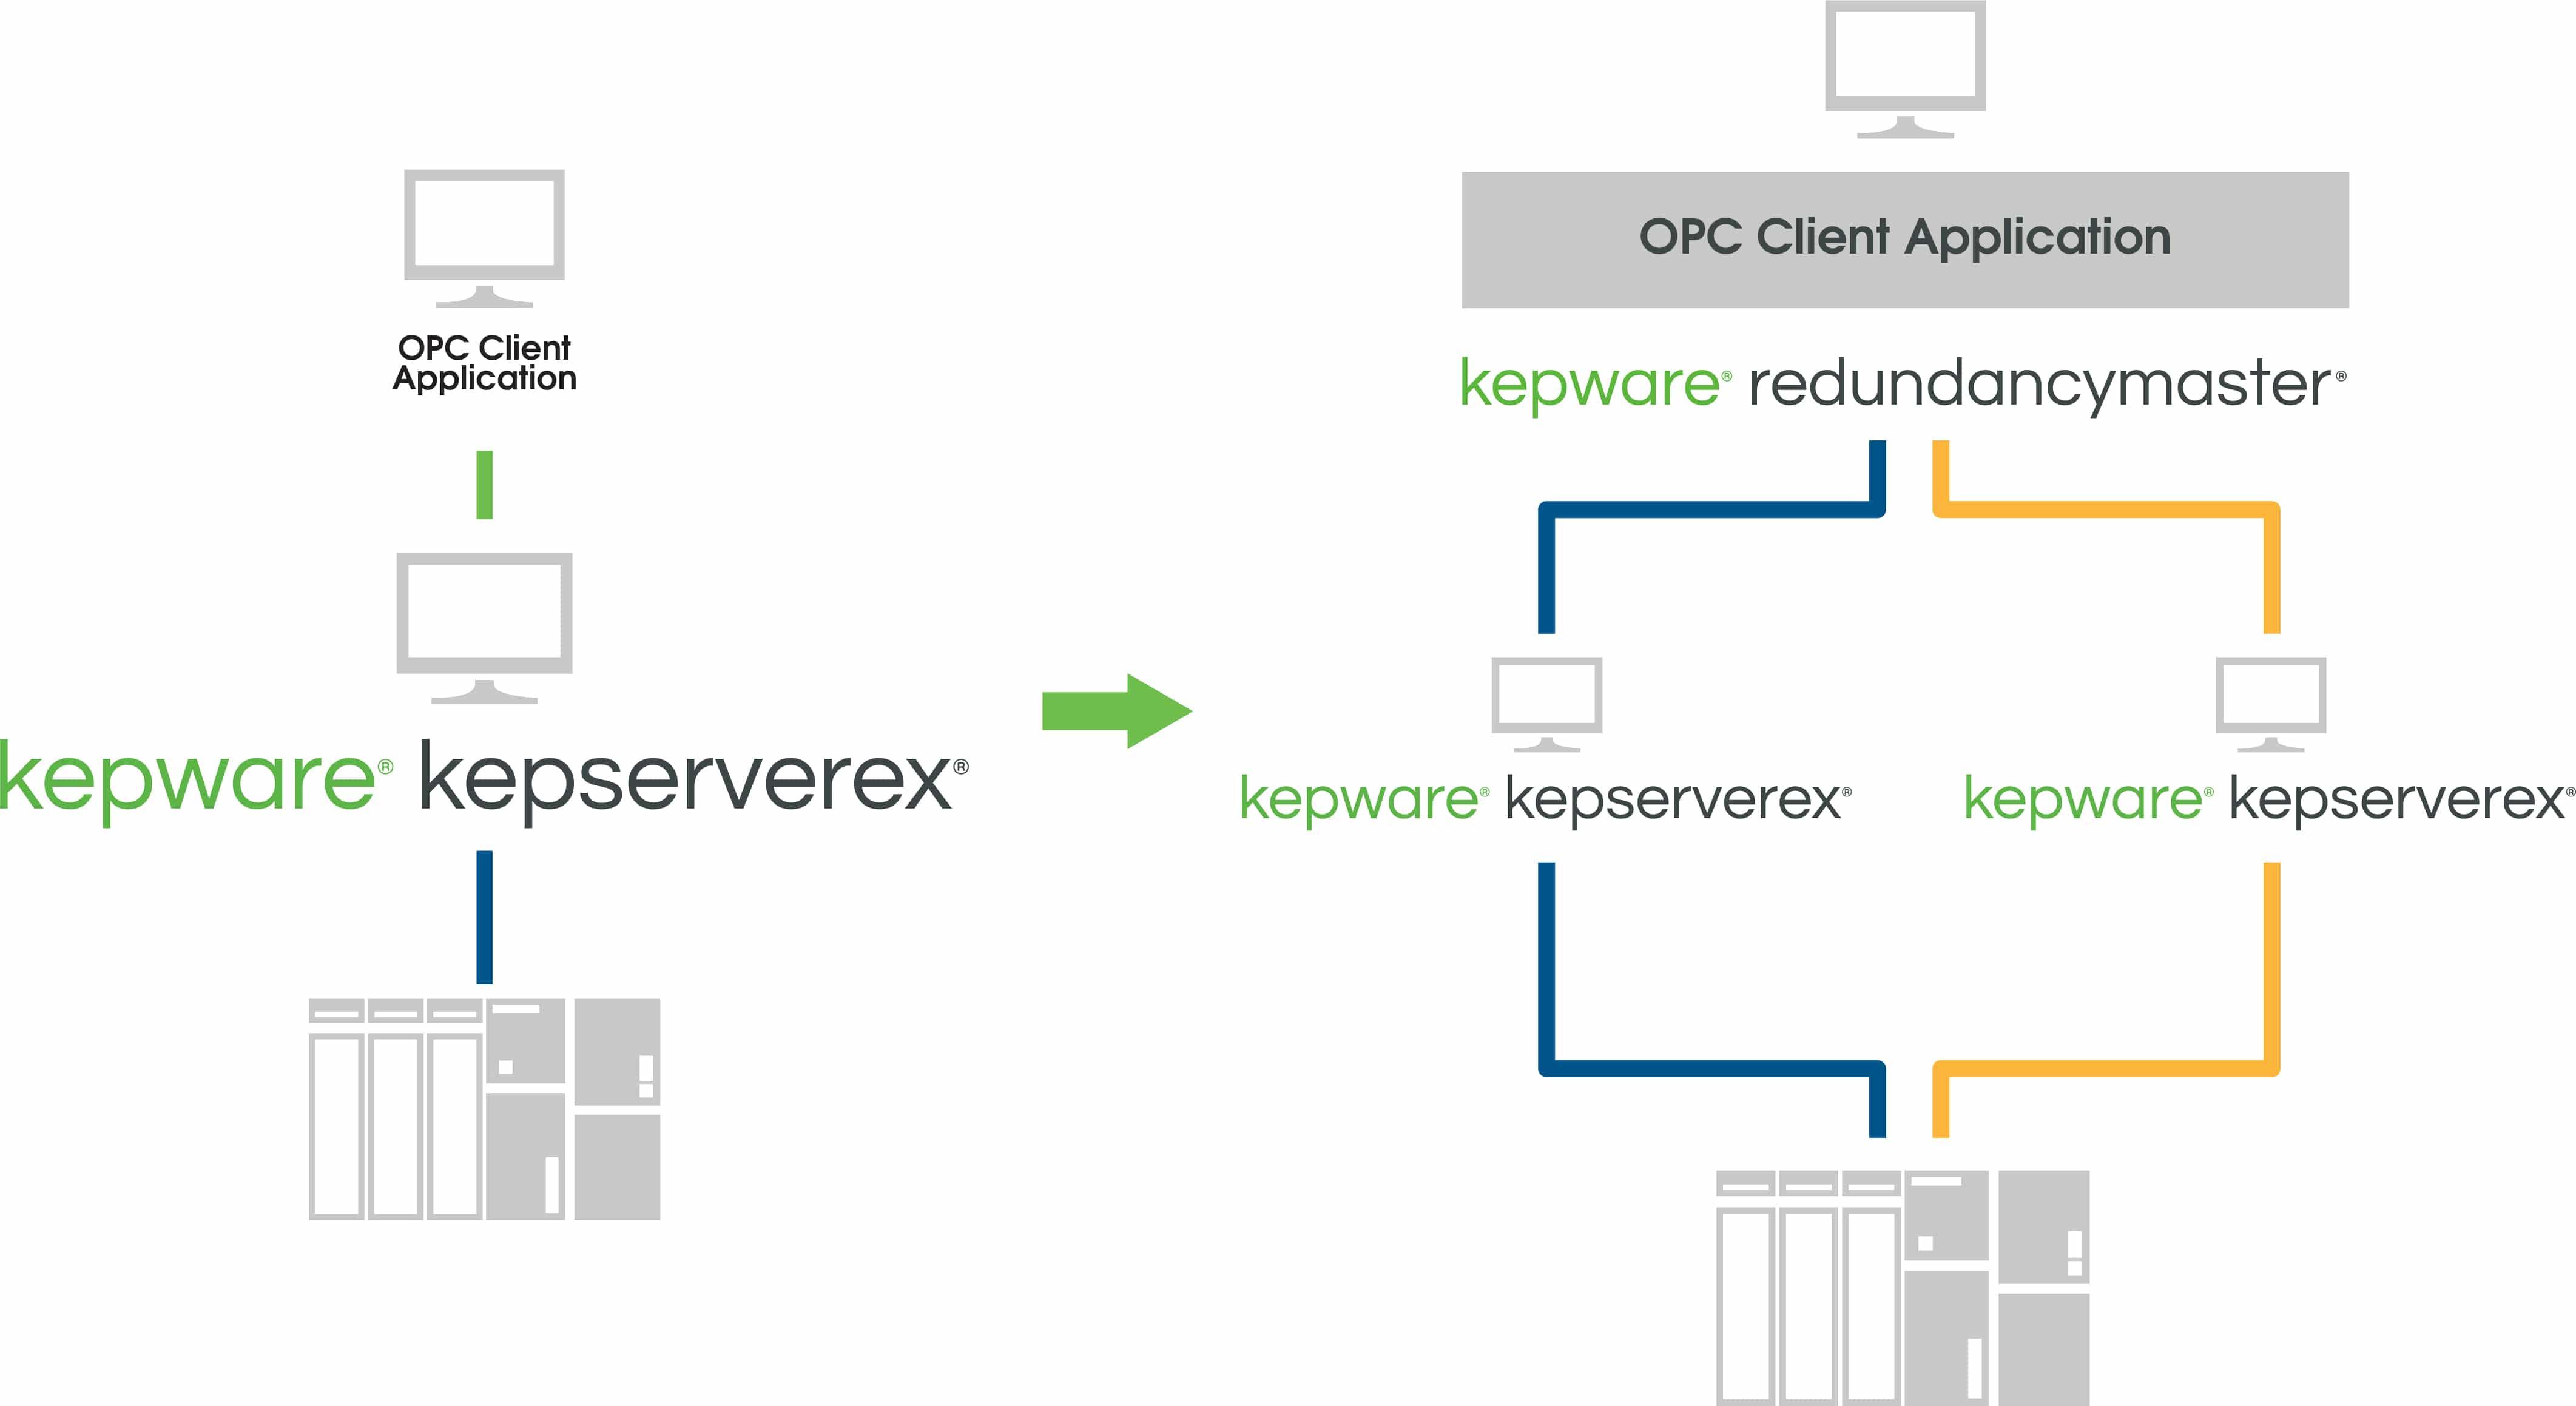 Kepware RedundancyMaster Diagram